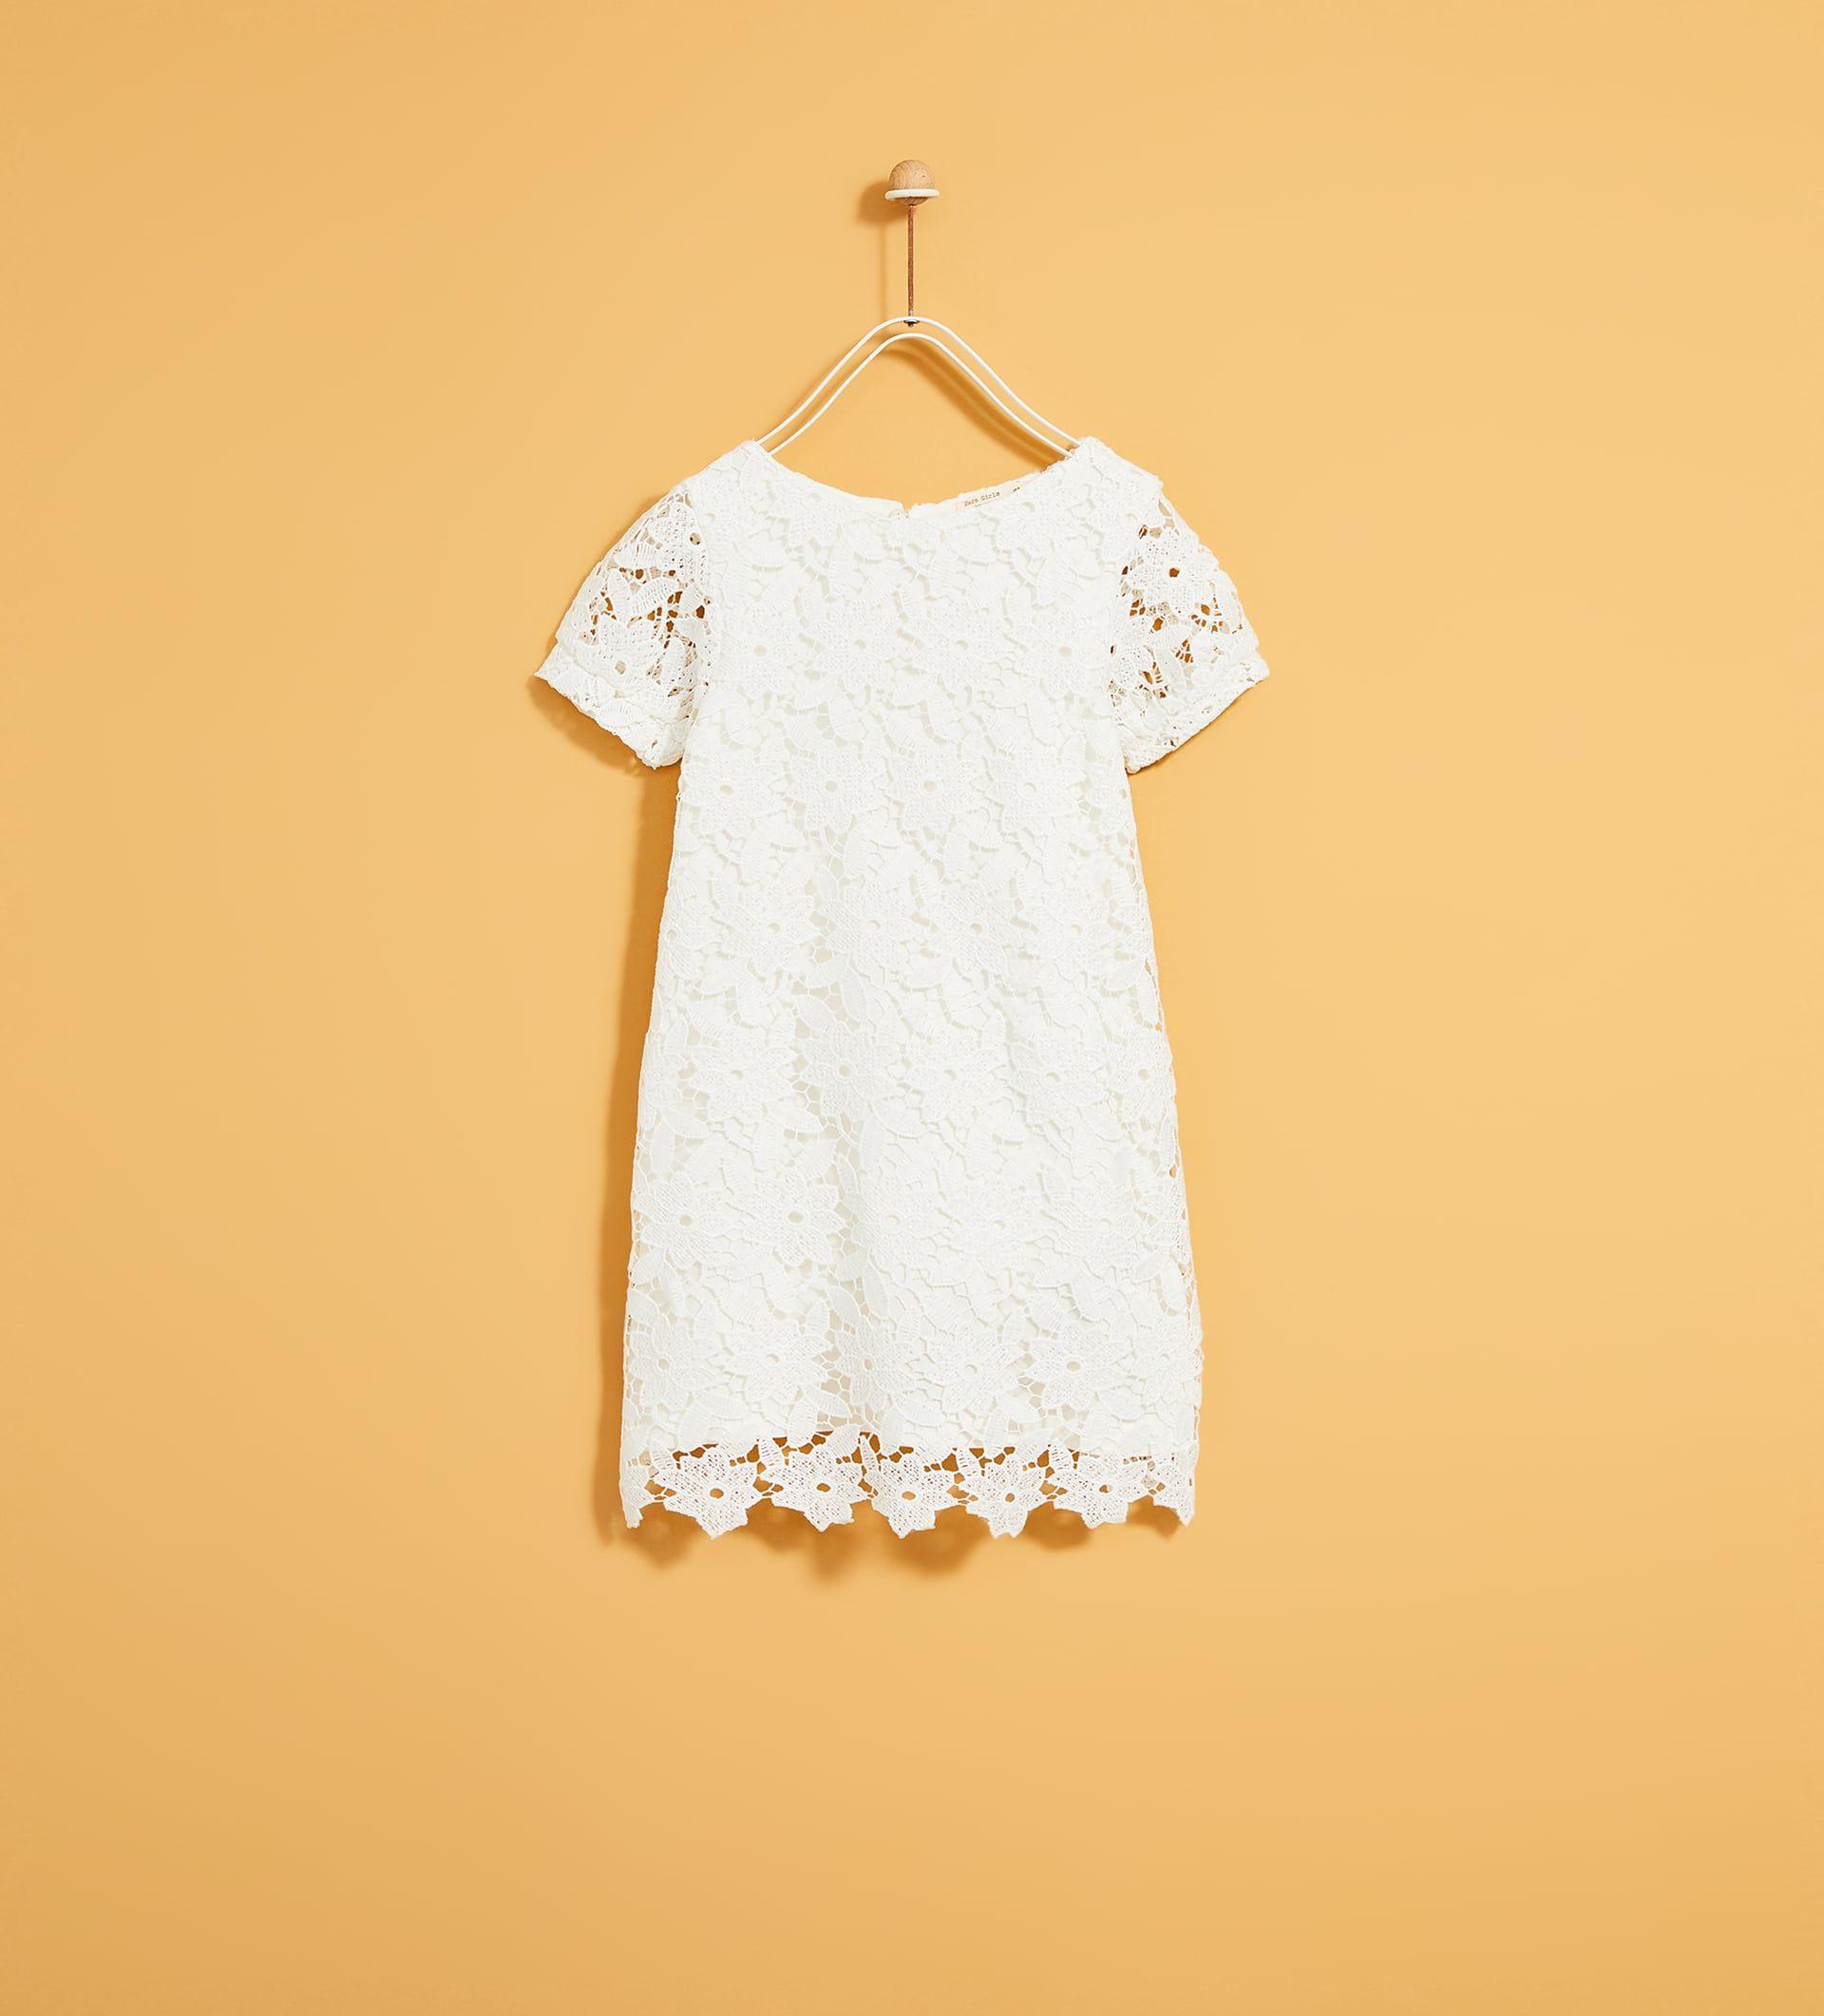 zara - kids - guipure lace dress | kleider, kleid spitze